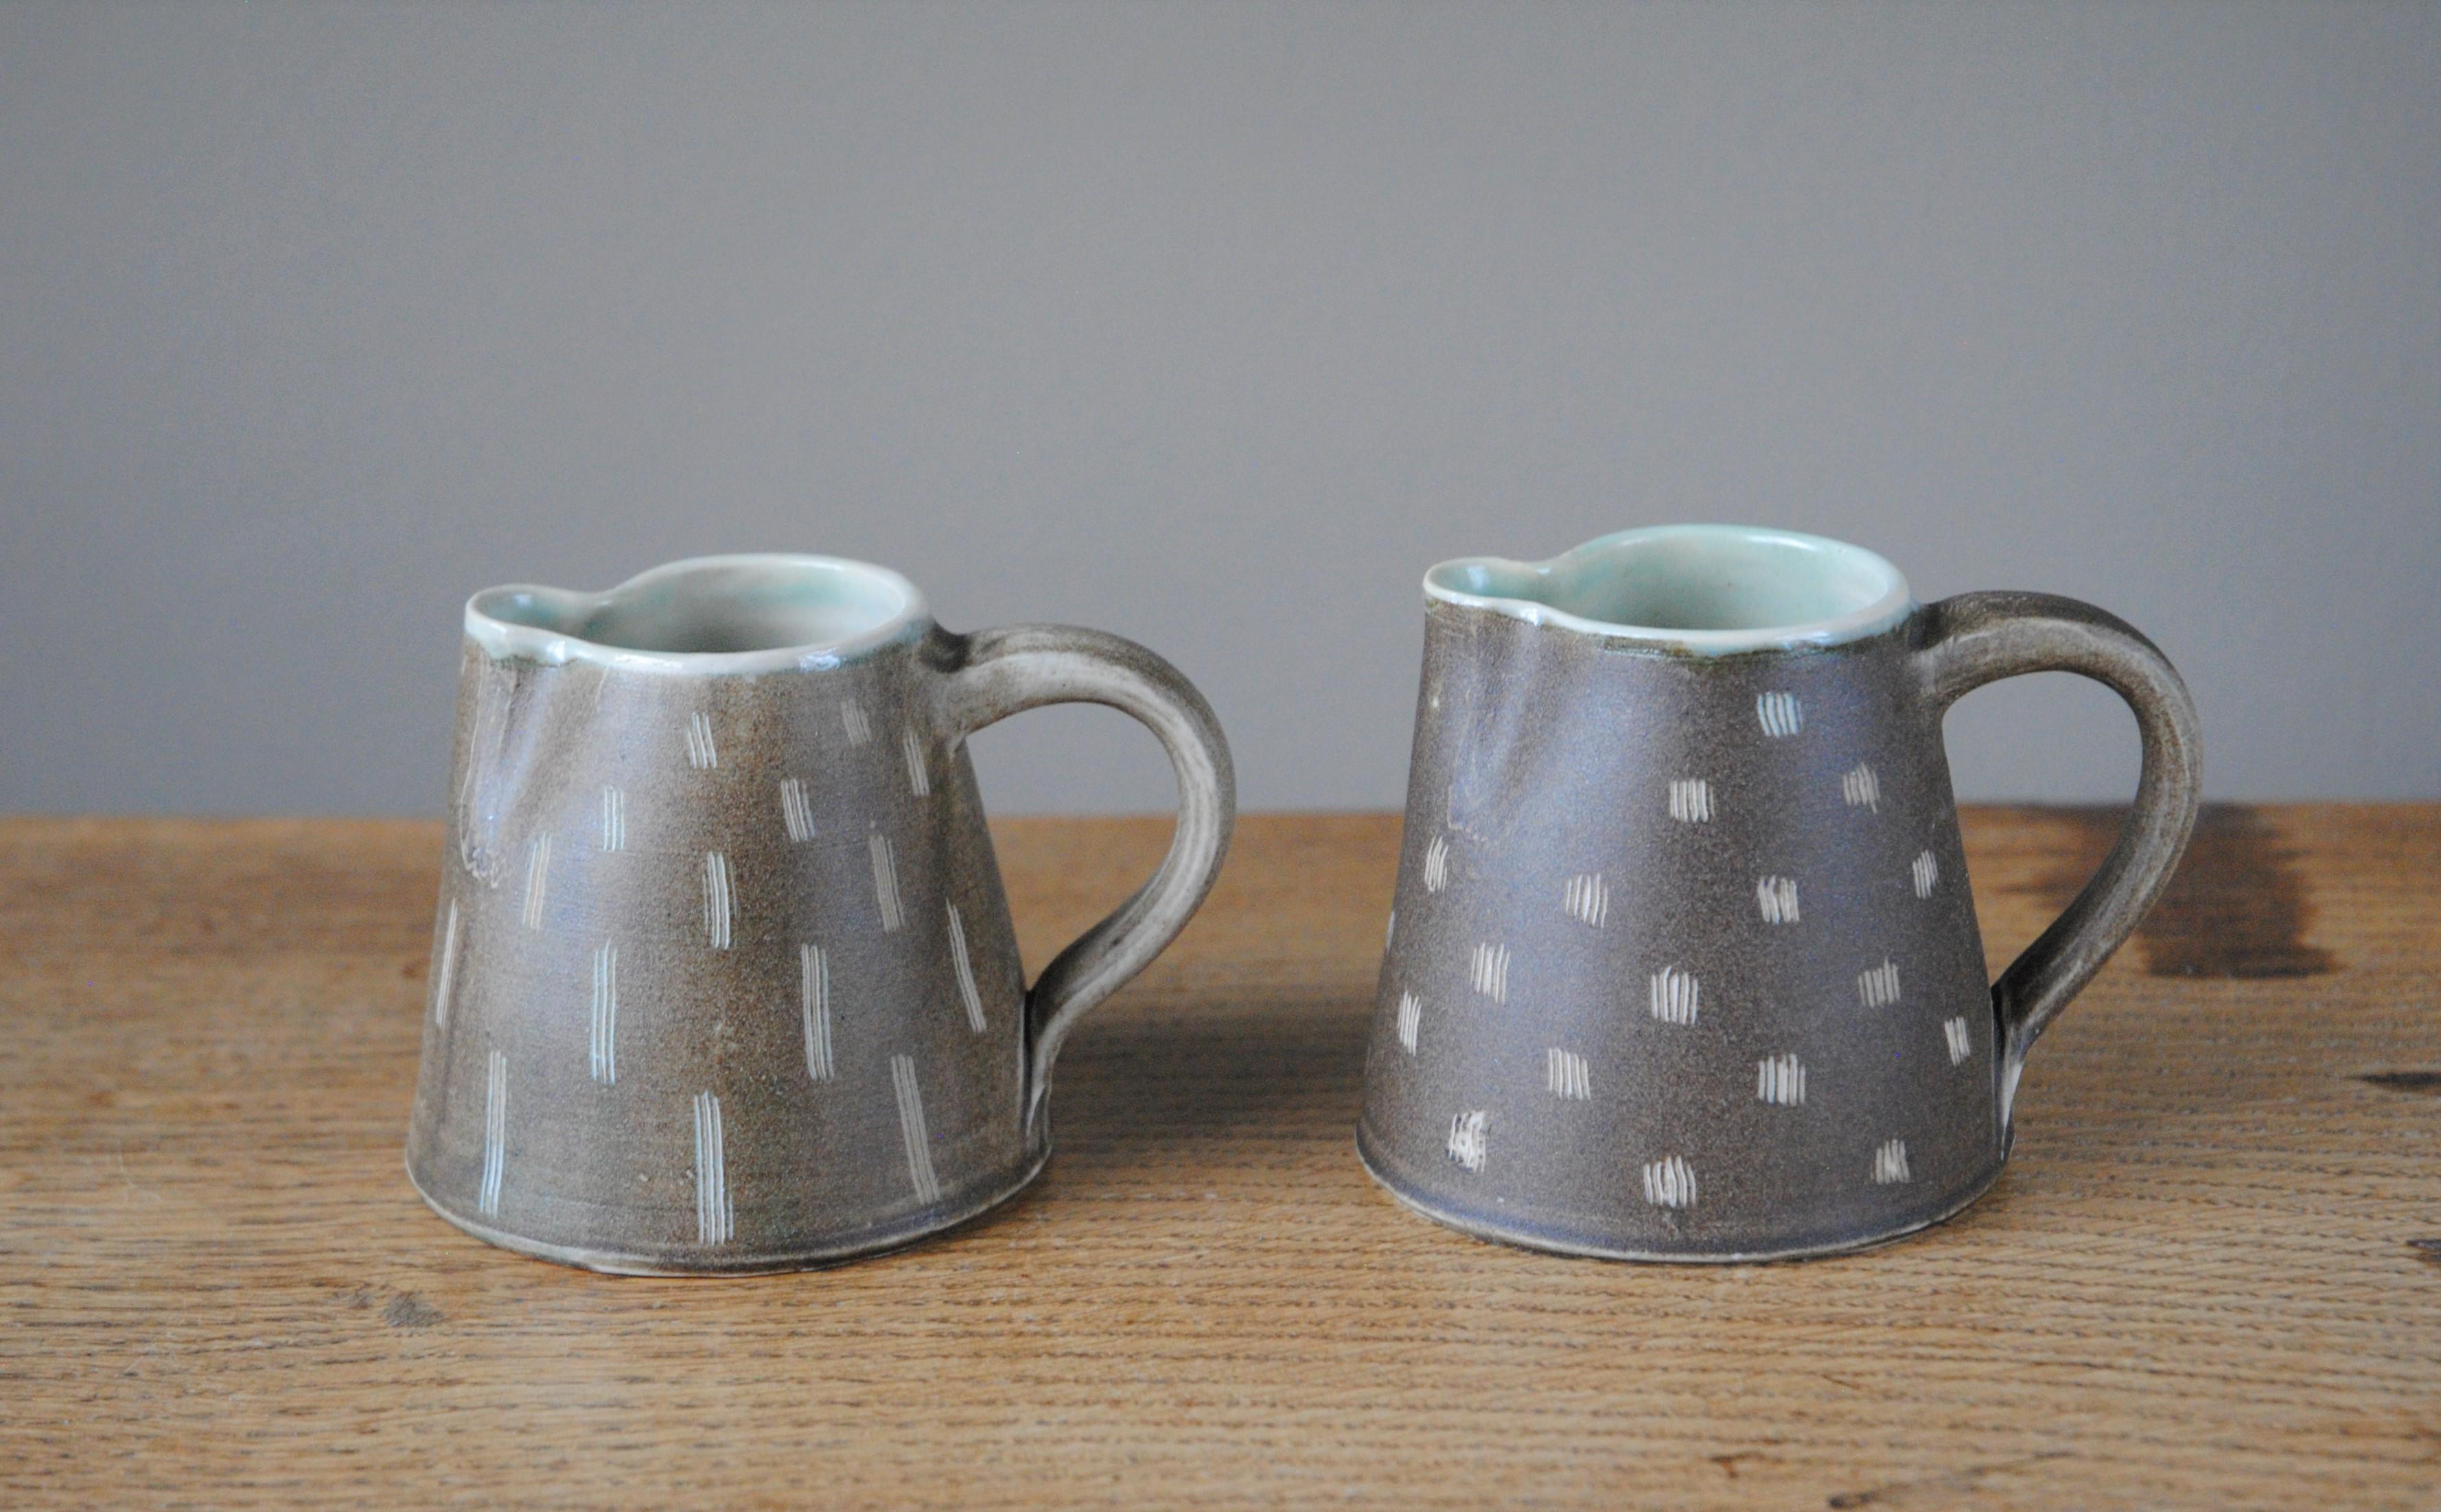 Cream jugs - alternative photo